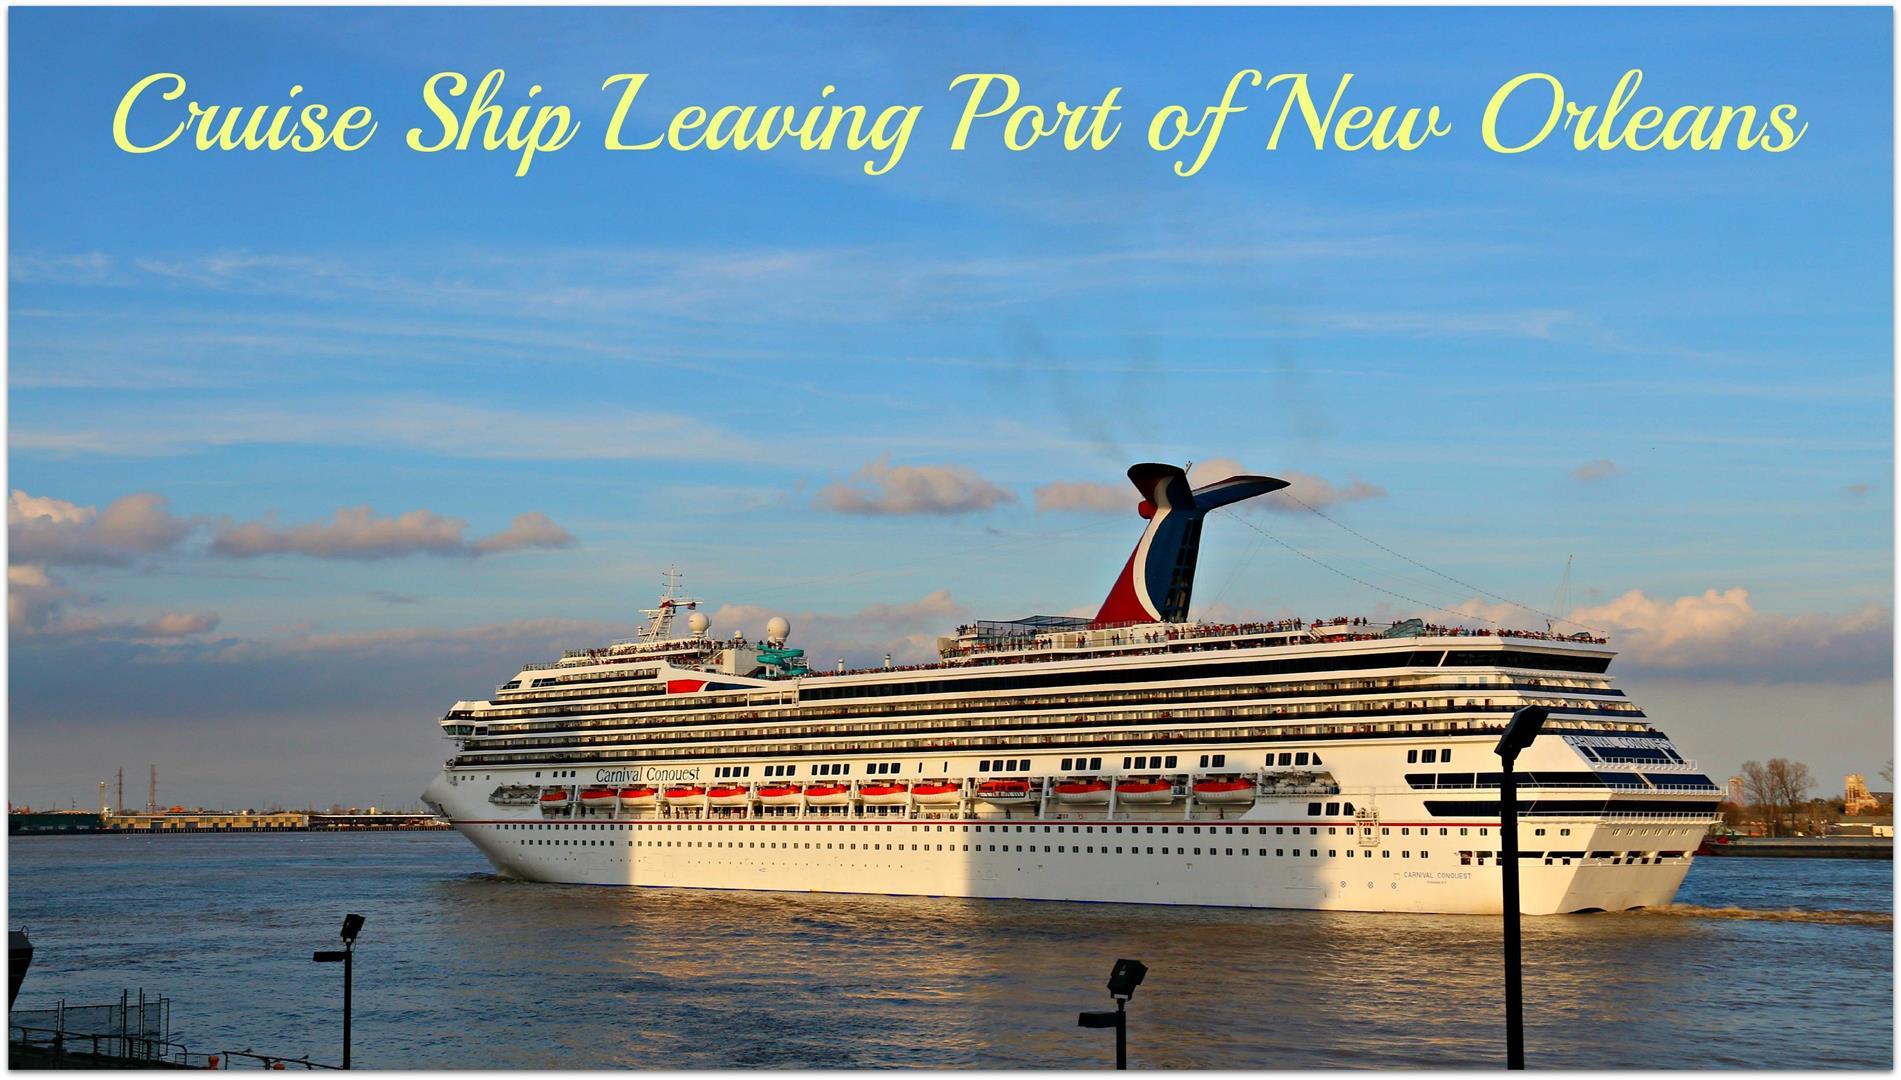 CruiseShipLeavingPortofNewOrleans.jpg